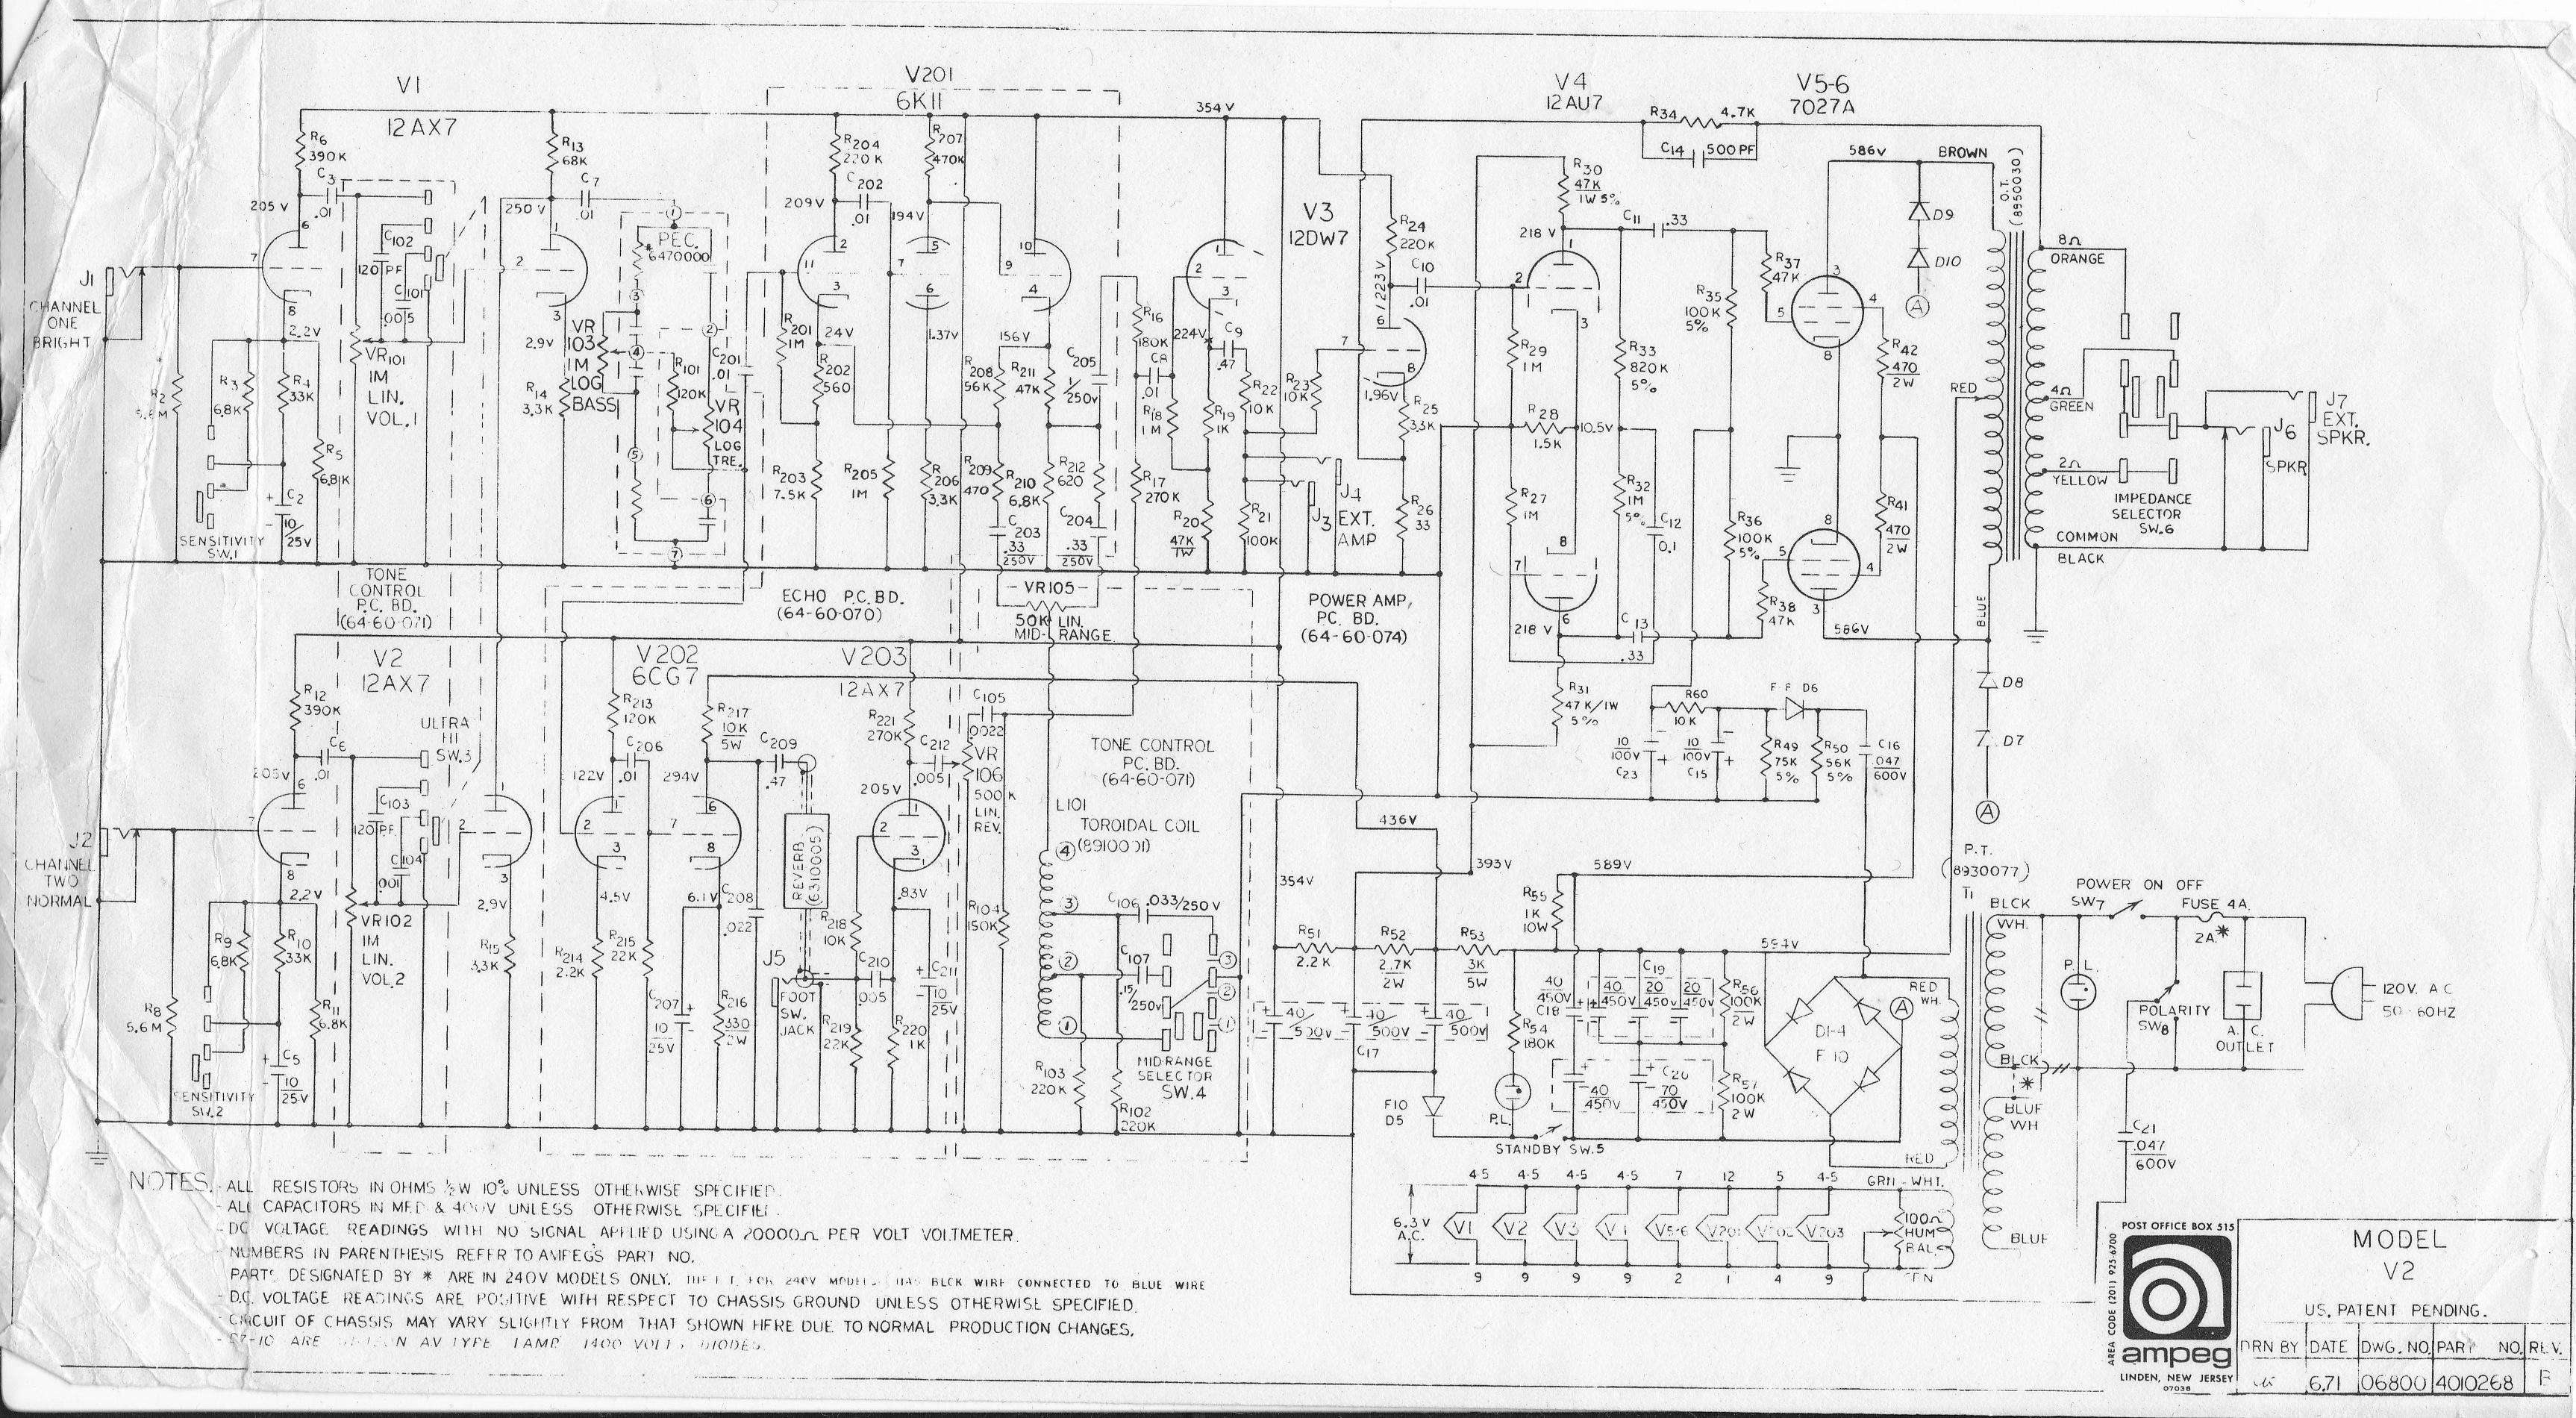 1974 Ampeg V2 (master volume mod help) | The Gear Page on marshall plexi tubes, marshall jcm 900 layout, marshall jcm pre amp, marshall tsl 100 first design, marshall parts list,